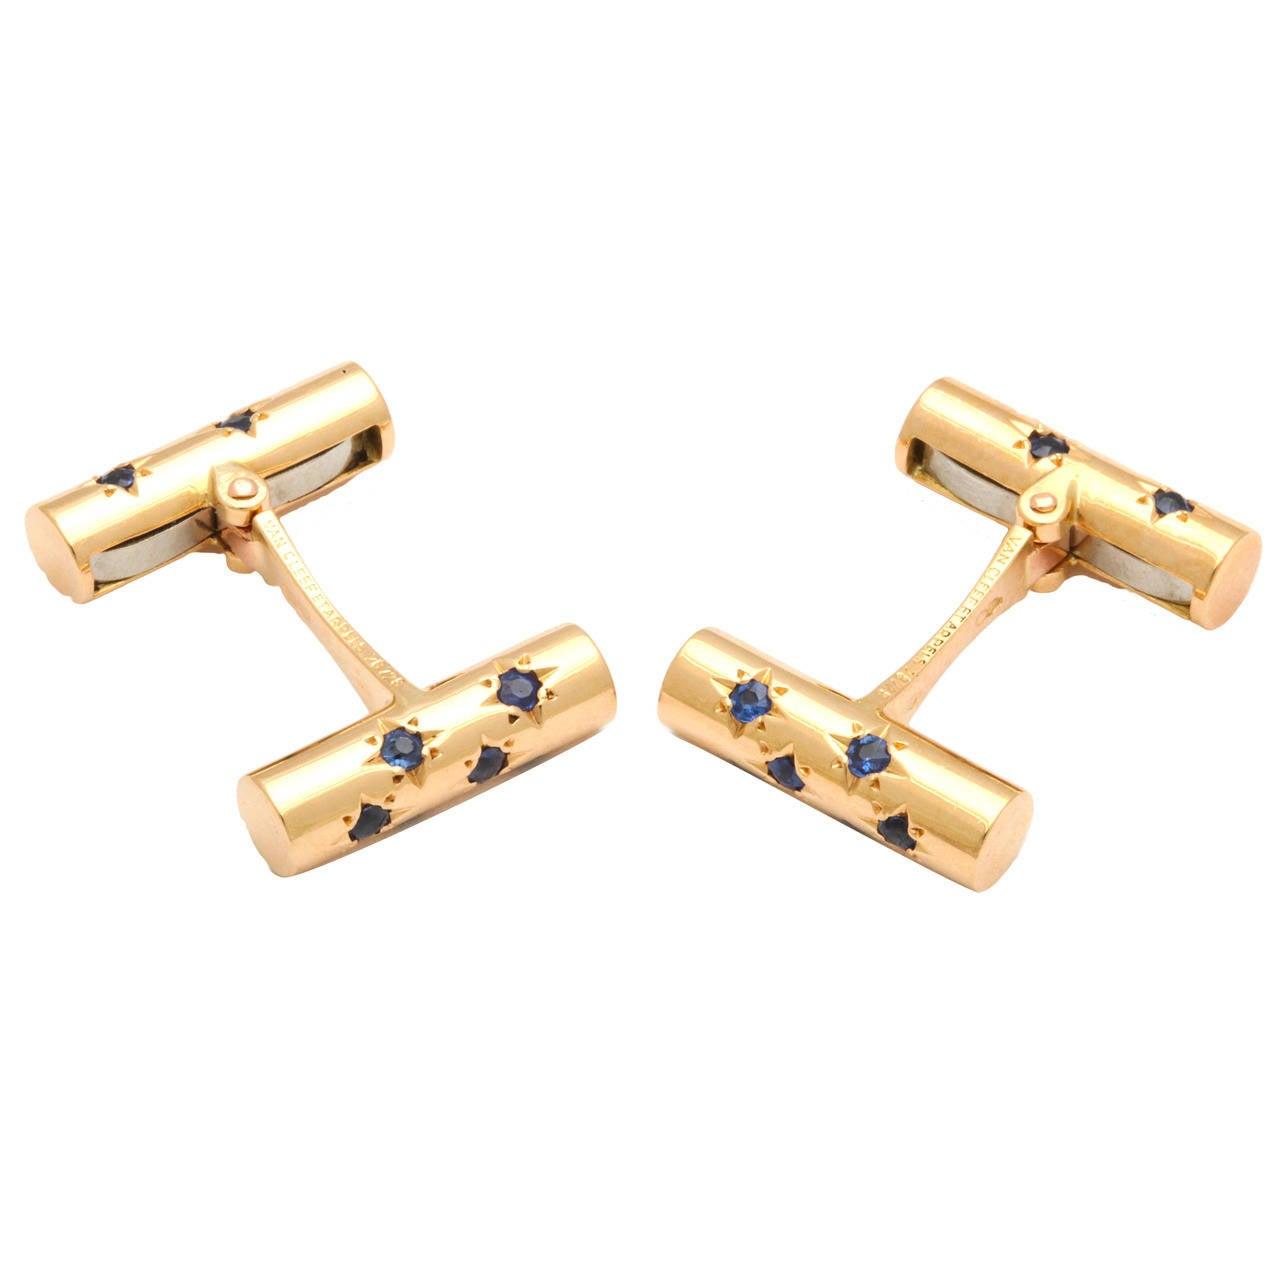 Van Cleef & Arpels Sapphire Gold Double Baton Cufflinks